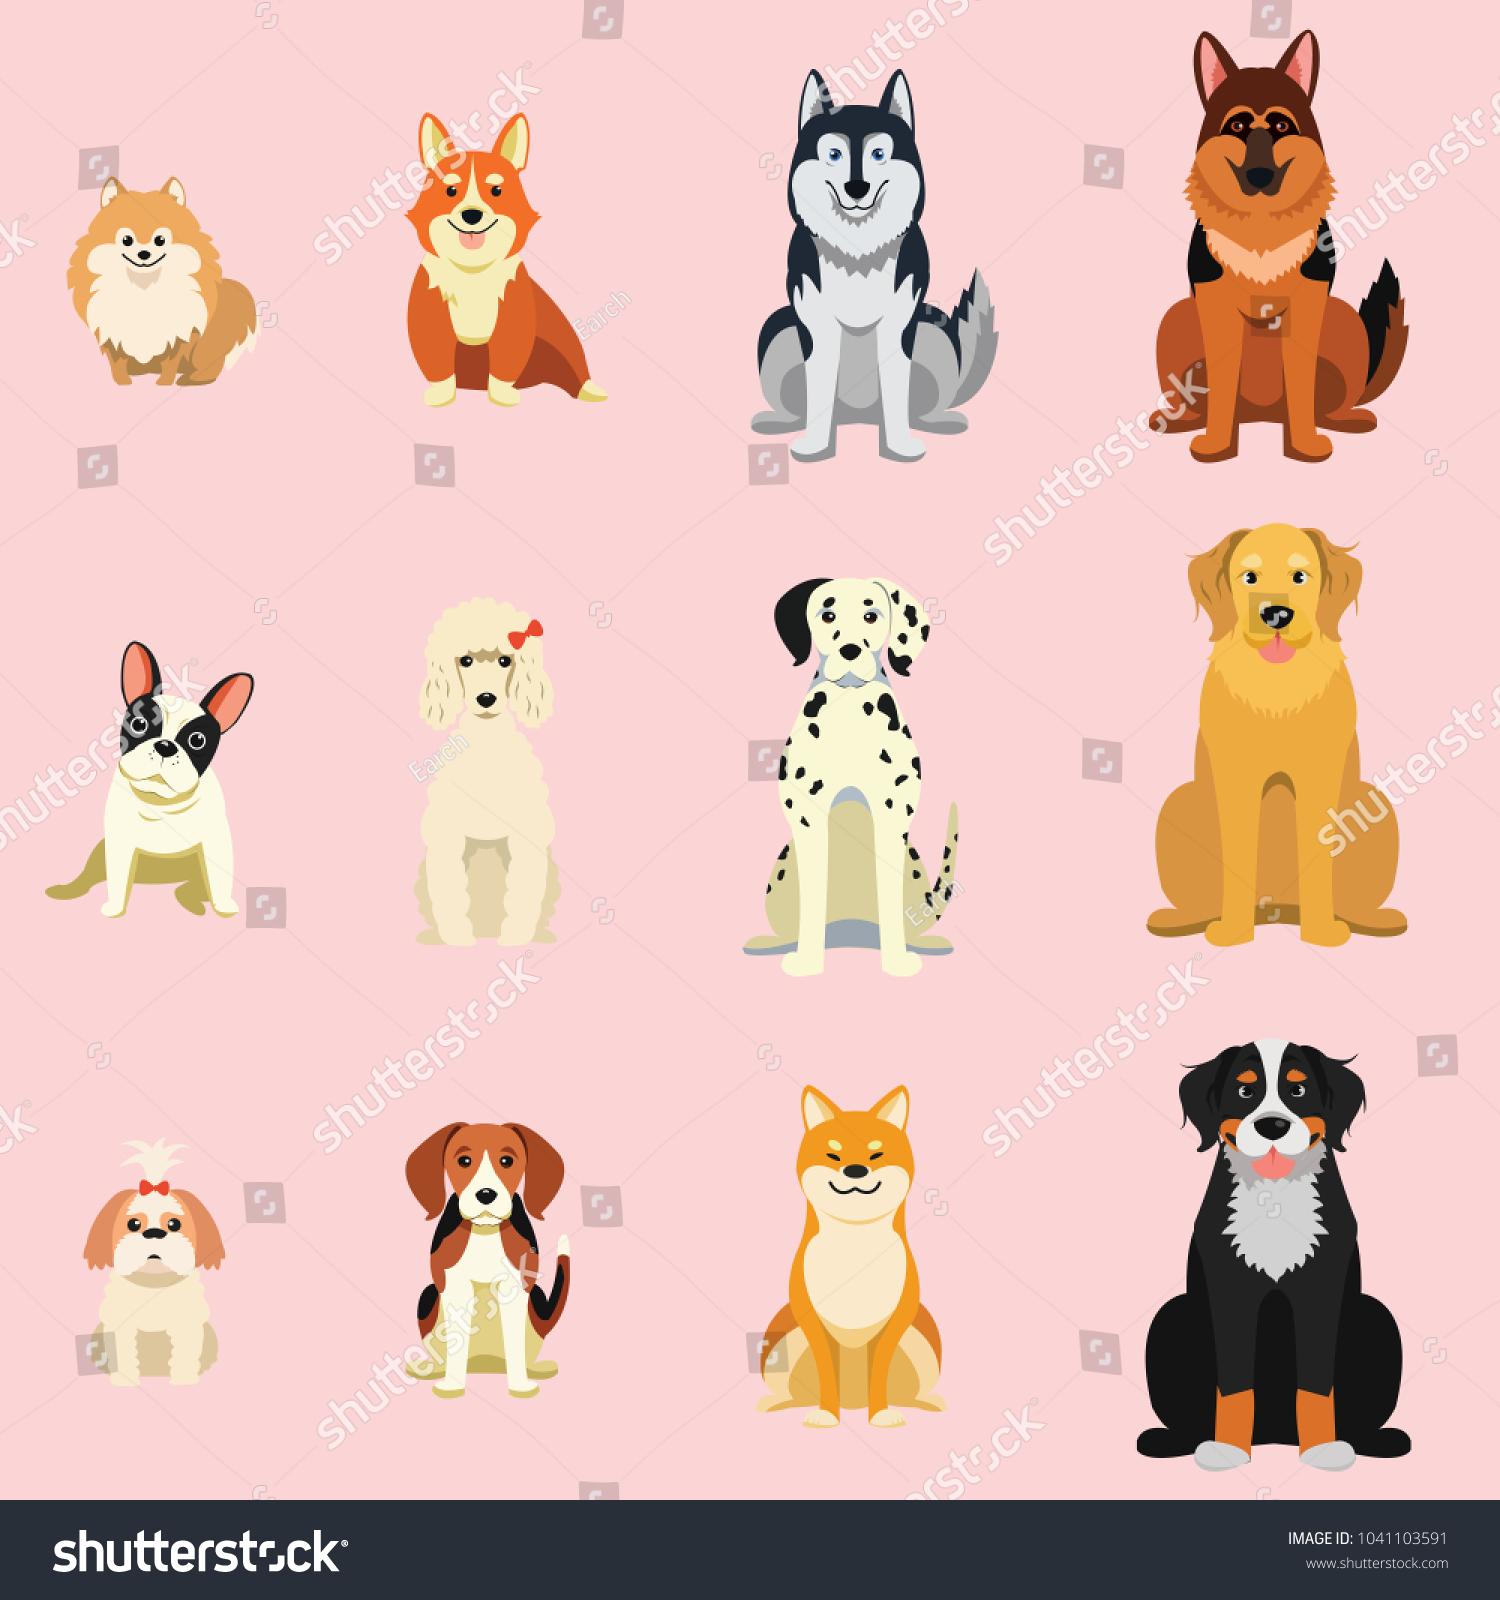 Dogs, Breed as icon cartoon style, Shiba inu, French bulldog, corgi, Siberian Husky, Dalmatian, in icon collection set.